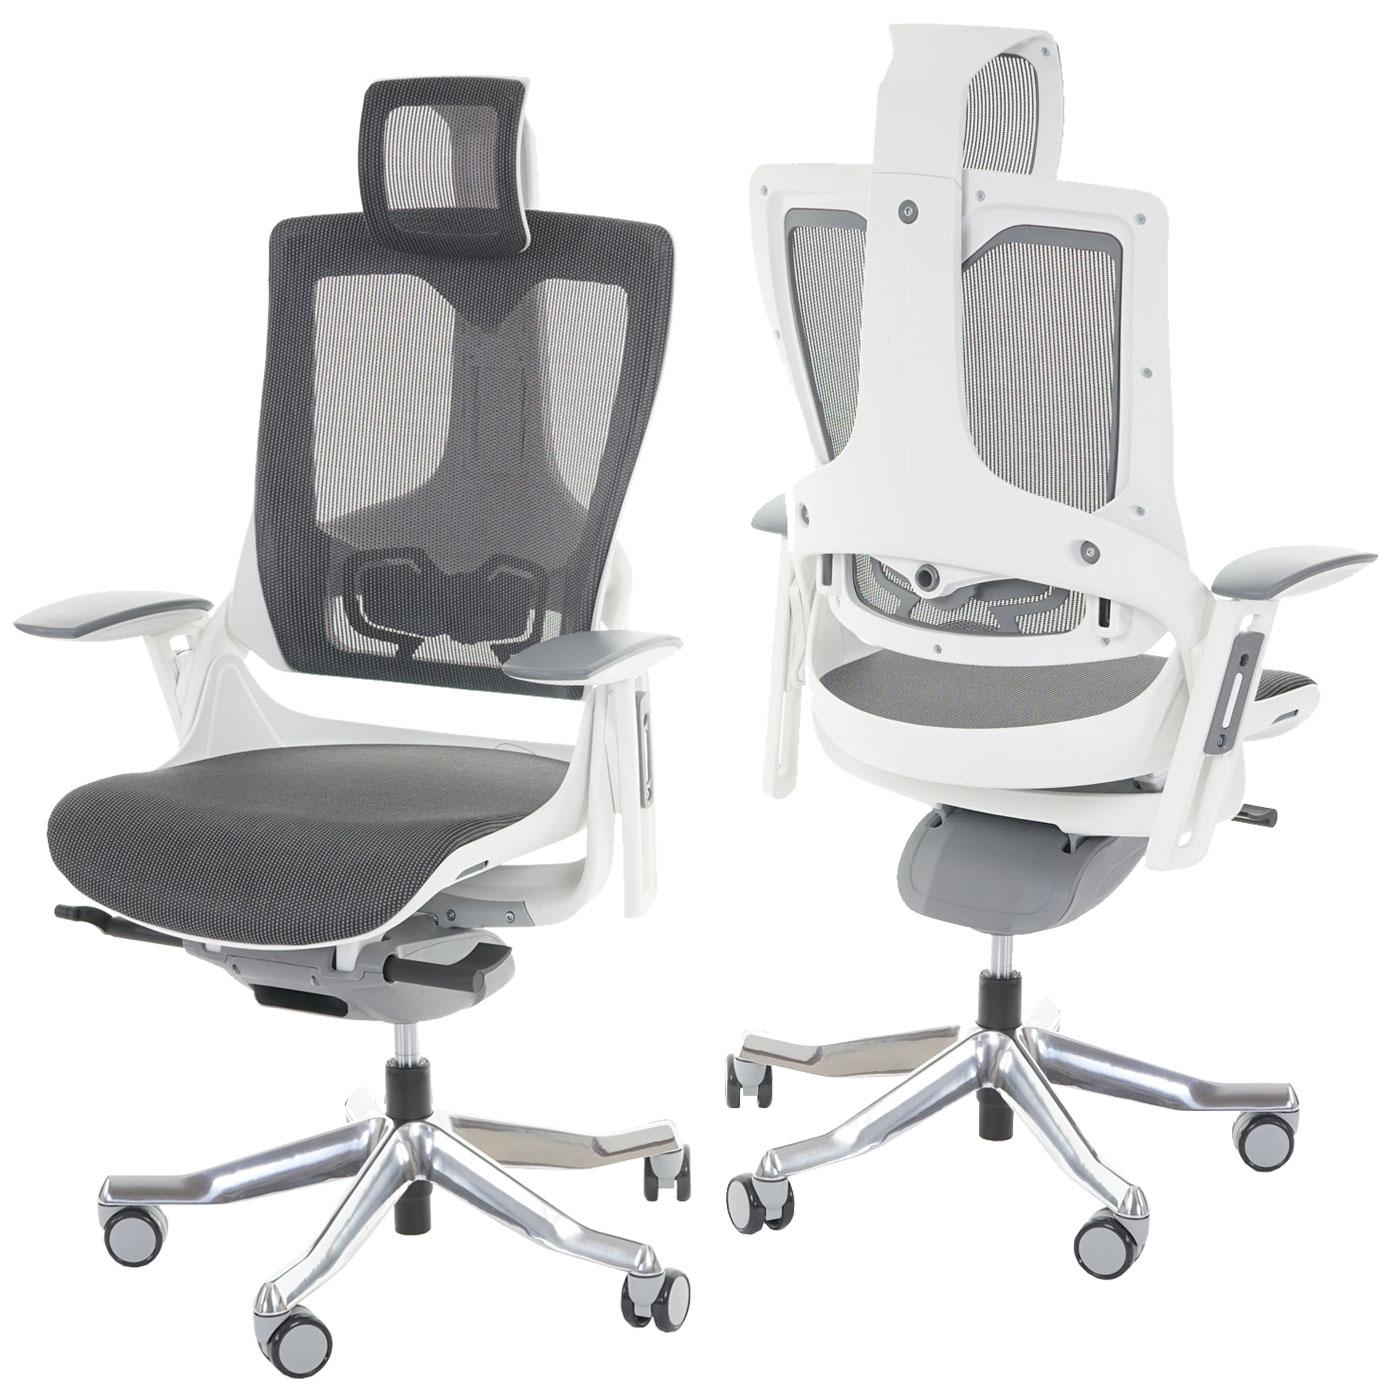 b rostuhl merryfair wau 2 schreibtischstuhl drehstuhl. Black Bedroom Furniture Sets. Home Design Ideas